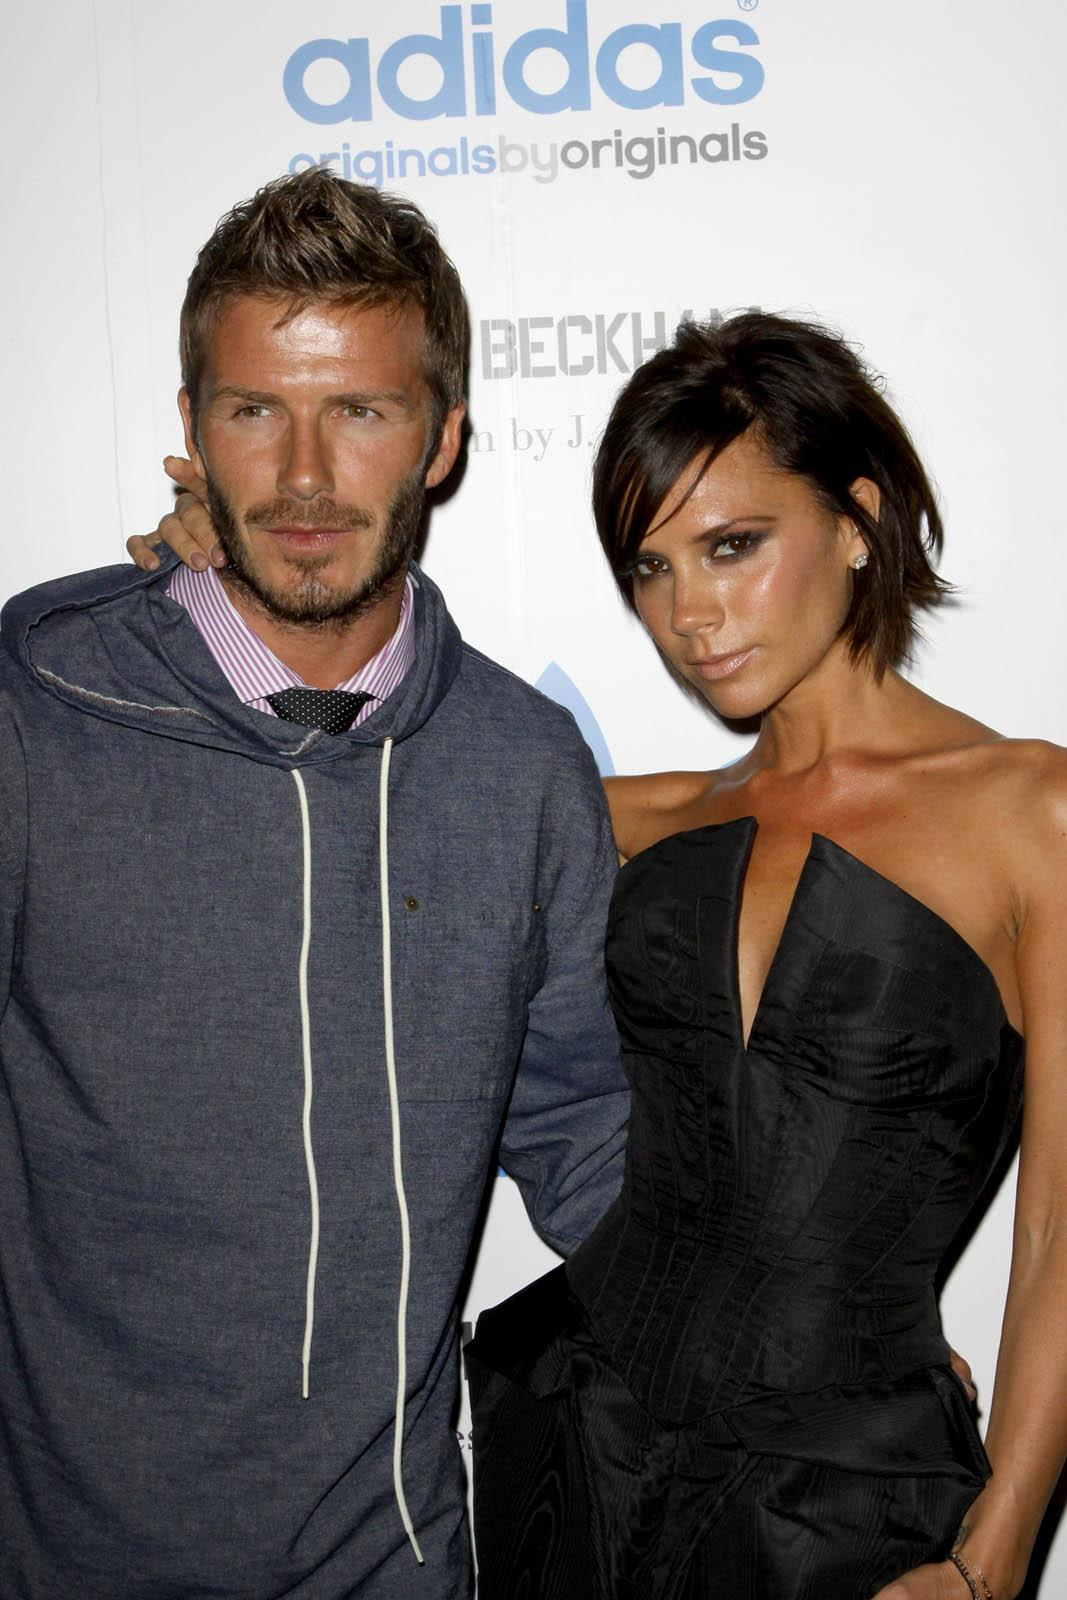 http://4.bp.blogspot.com/-LqY_jMJIyJo/ULNOkUJ1TpI/AAAAAAAAWoA/-TYqsczWMXE/s1600/Victoria+Beckham+18.jpeg